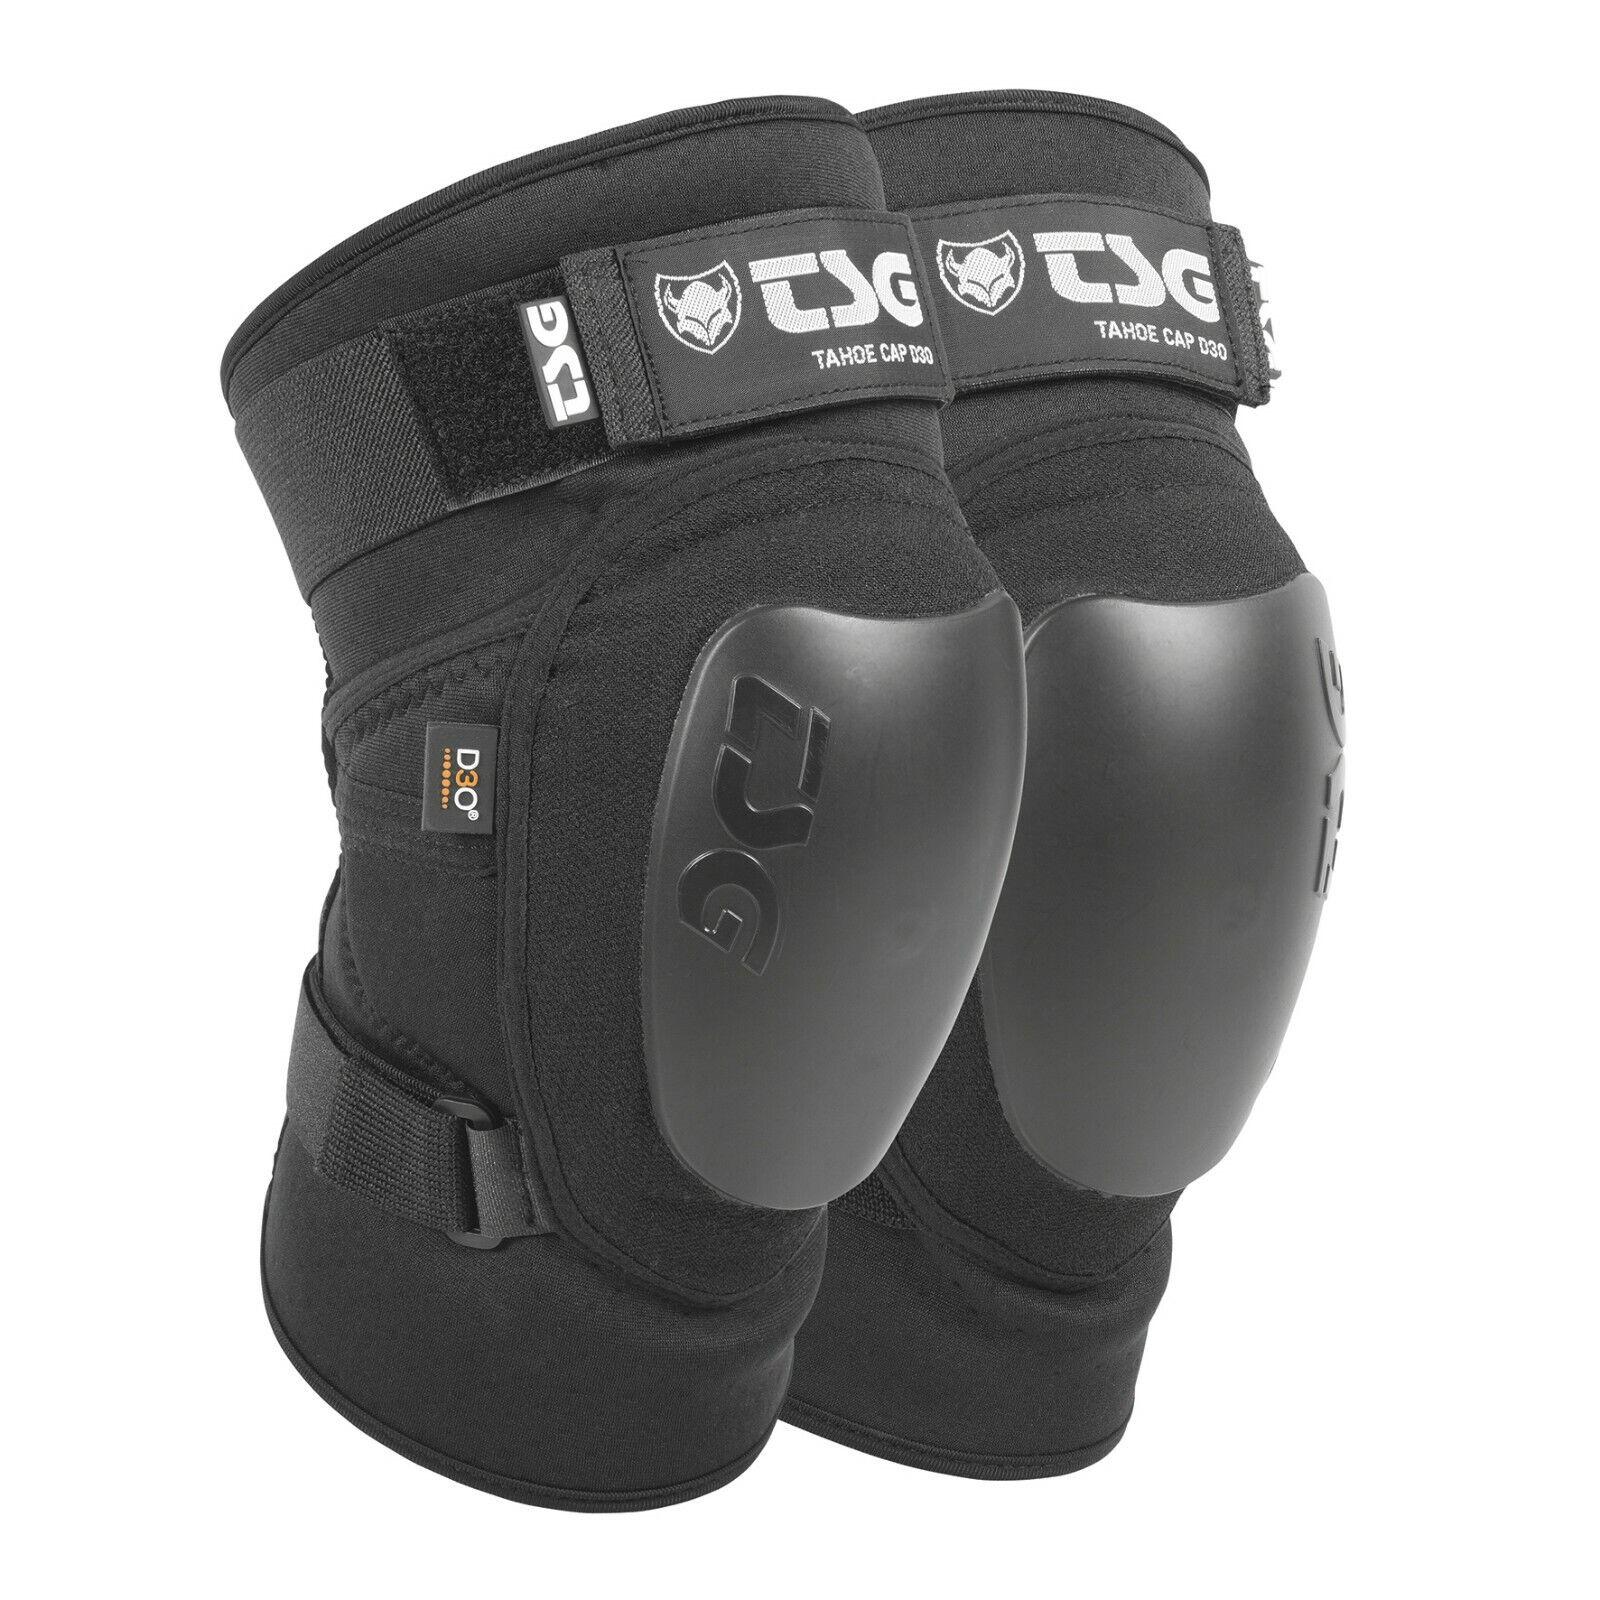 Troxell USA Super Soft Large Hi-Viz Fluorescent Green Knee Pads